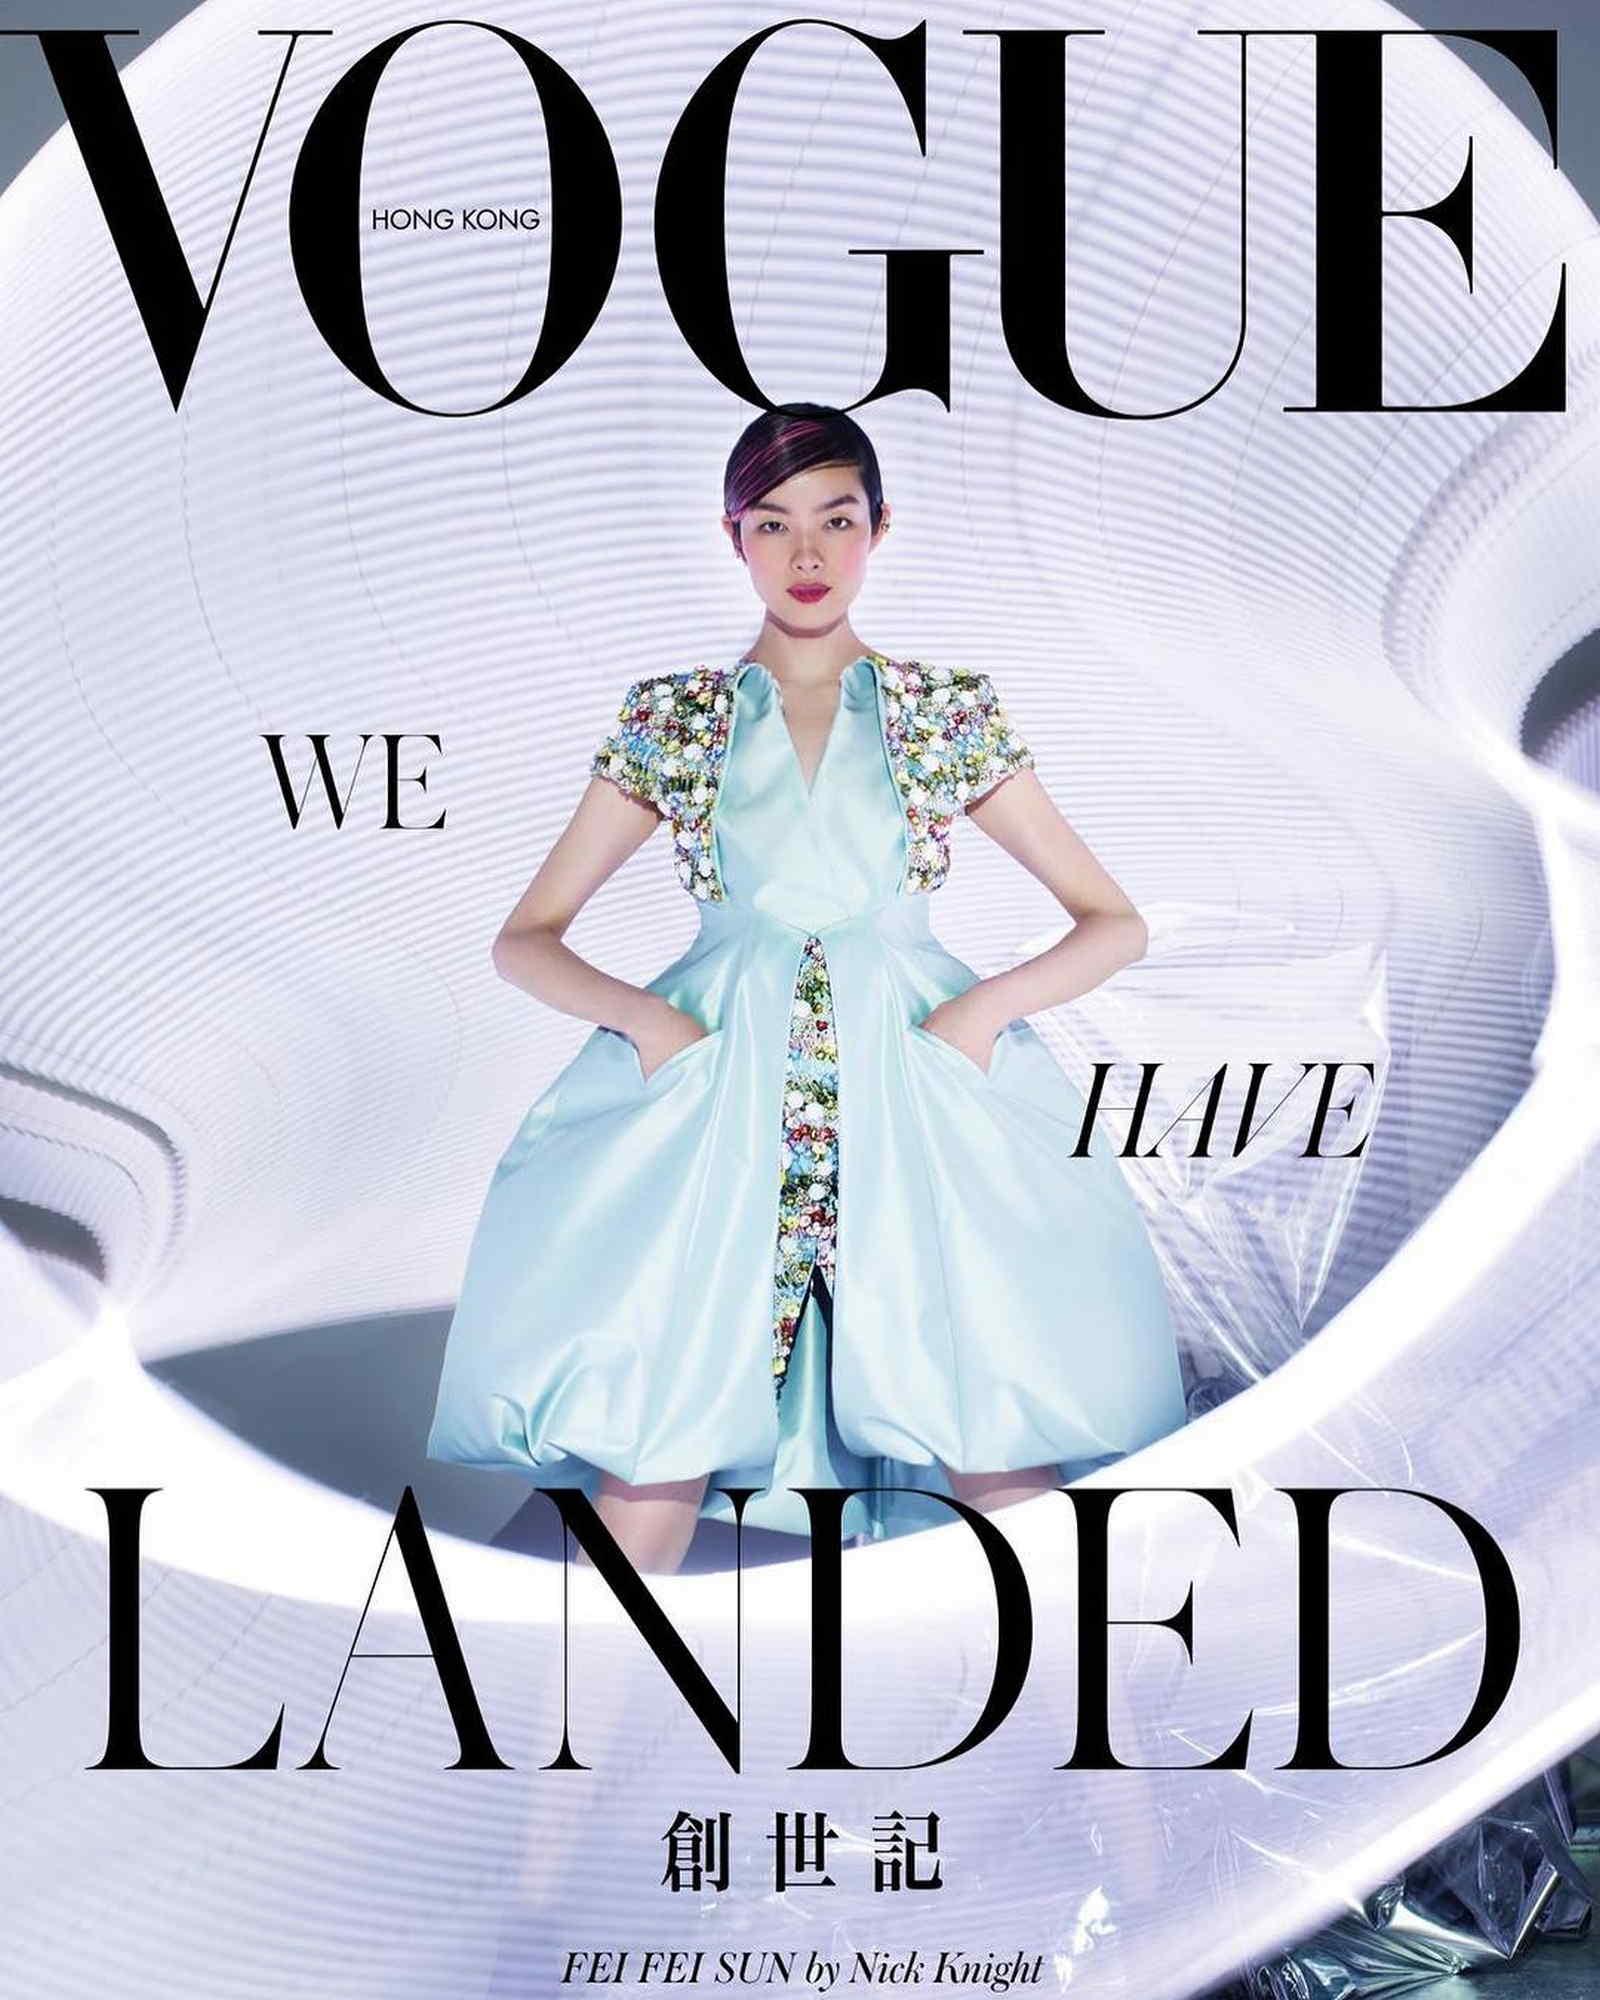 Gigi-Hadid-Fei-Fei-Sun-Vogue-Hong-Kong-March-20192.jpg